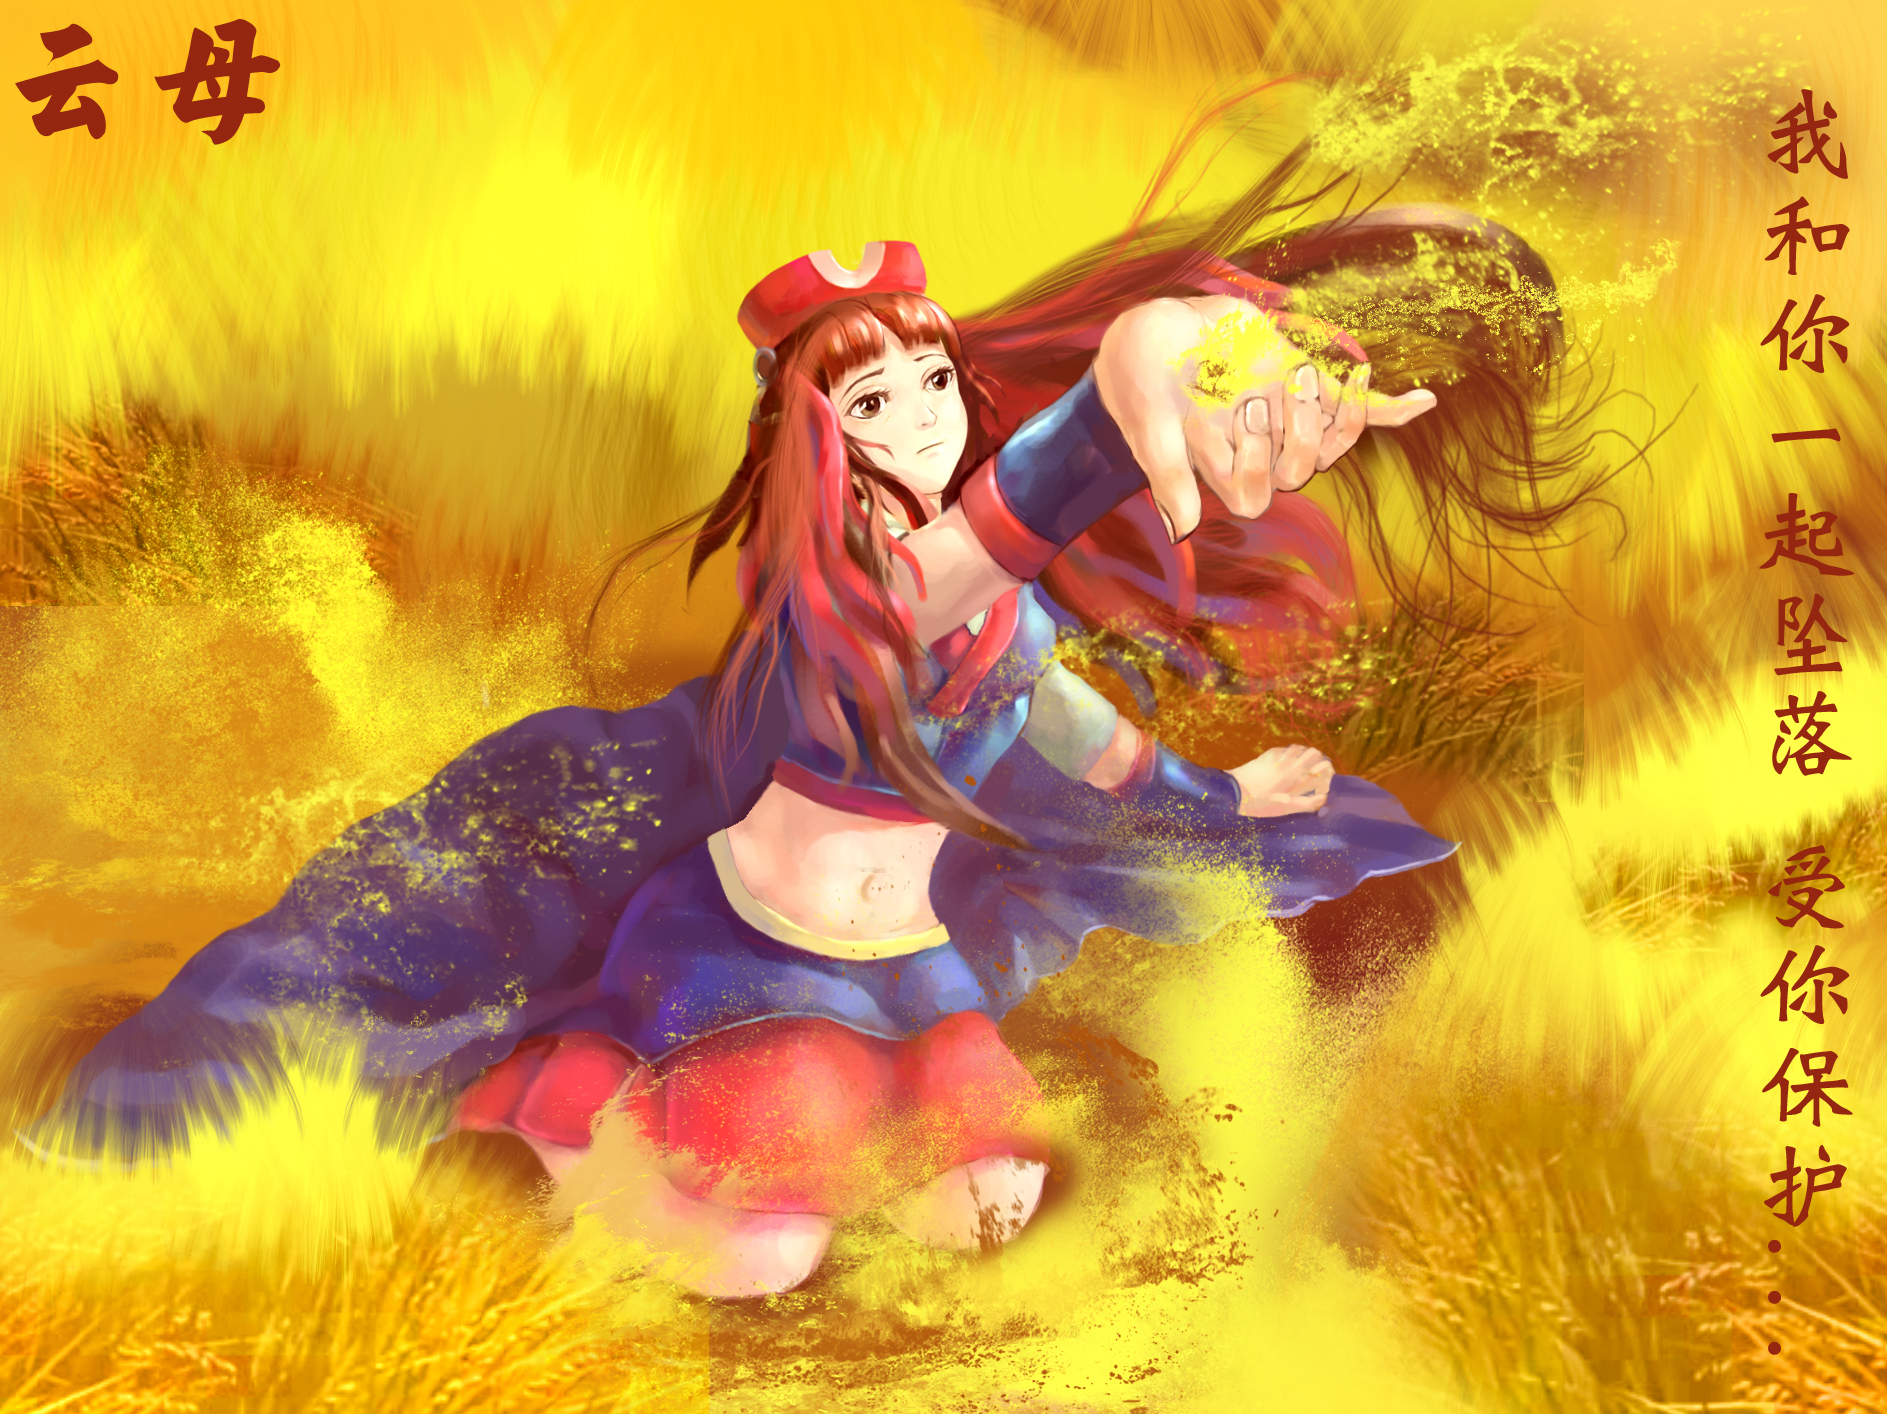 Samurai 7 Anime Characters : Kirara samurai 7 image #1259178 zerochan anime image board